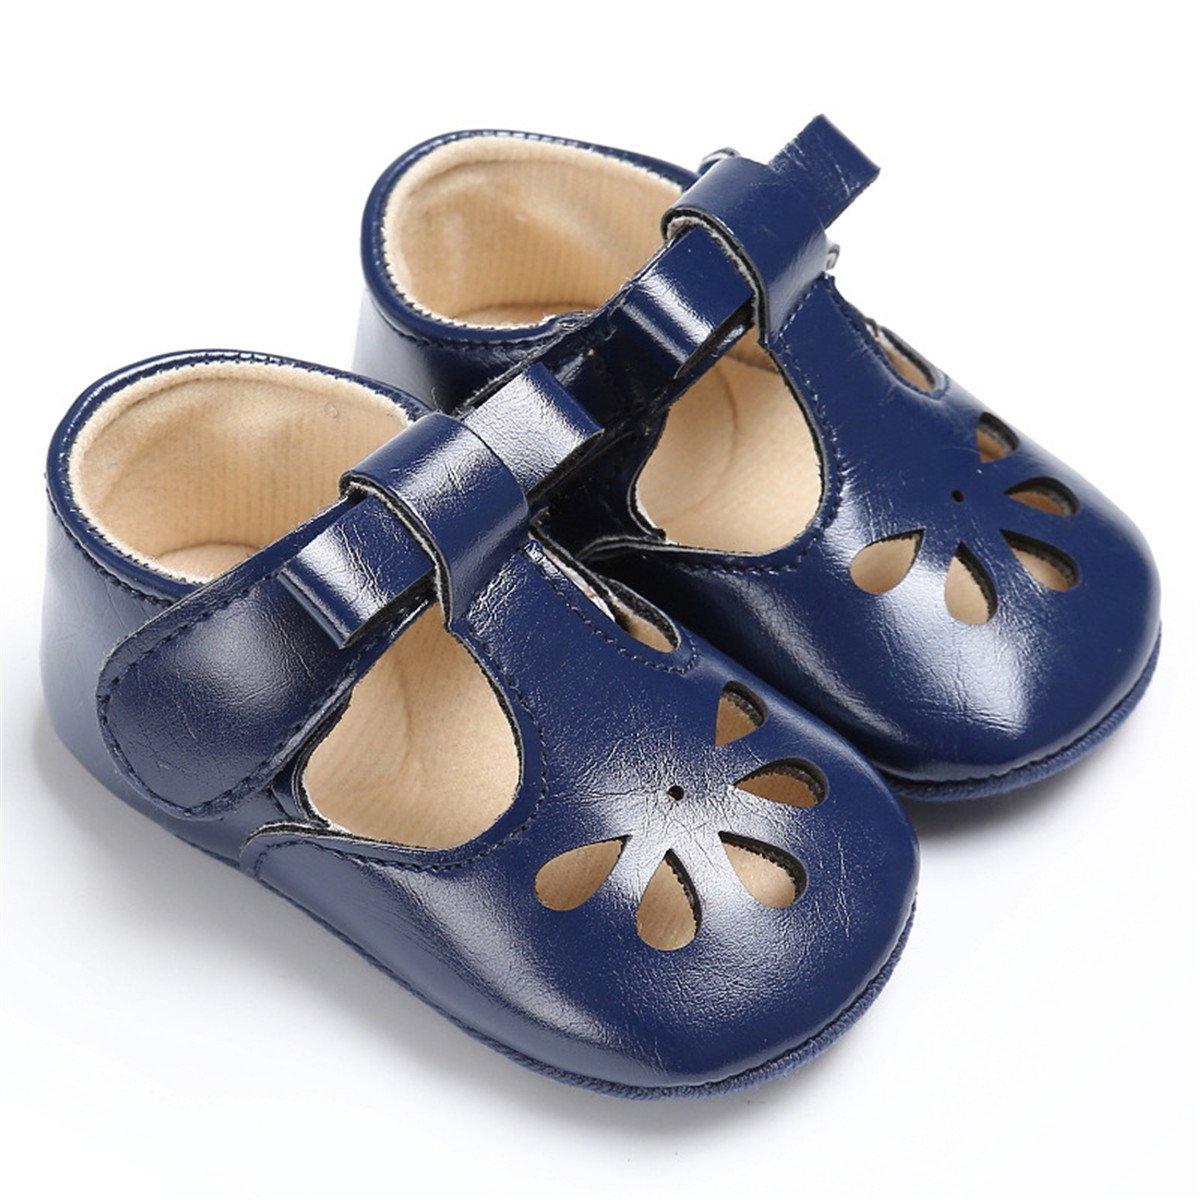 BENHERO Baby Girls Soft Sole Bowknot Mary Jane Princess Shoes (Infant) 1550